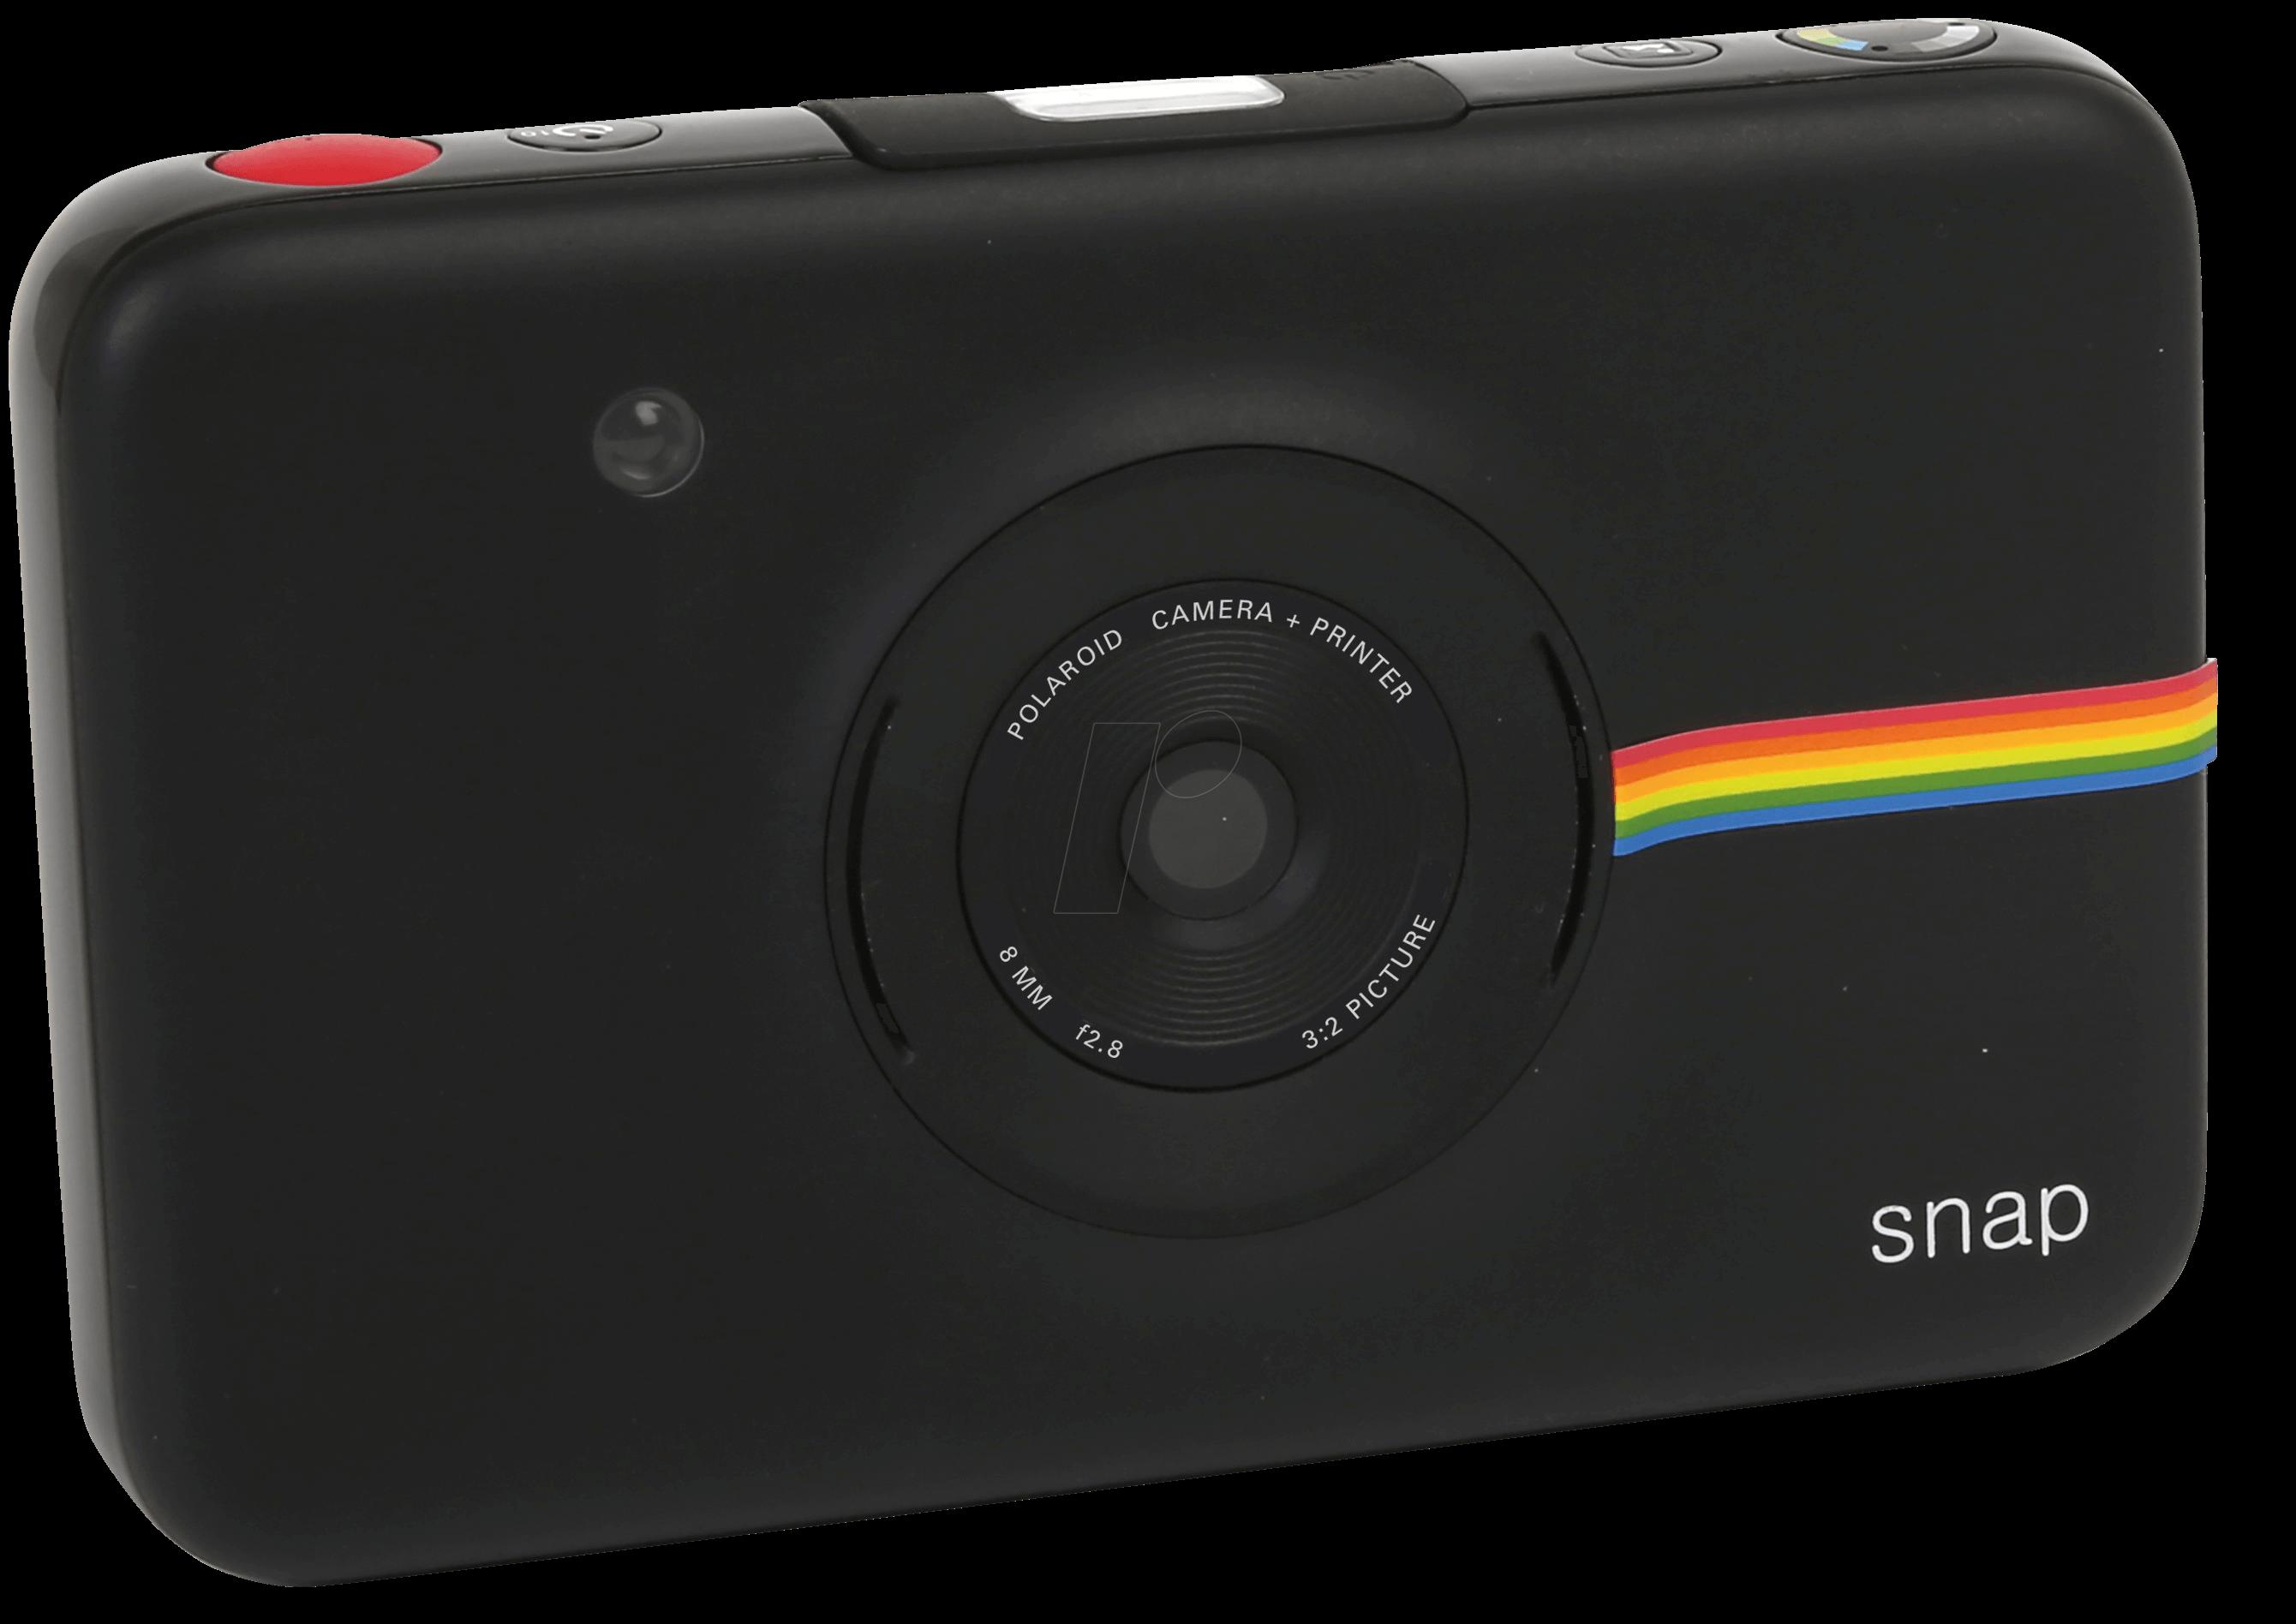 polaroid sp01b instant digital camera black at reichelt elektronik